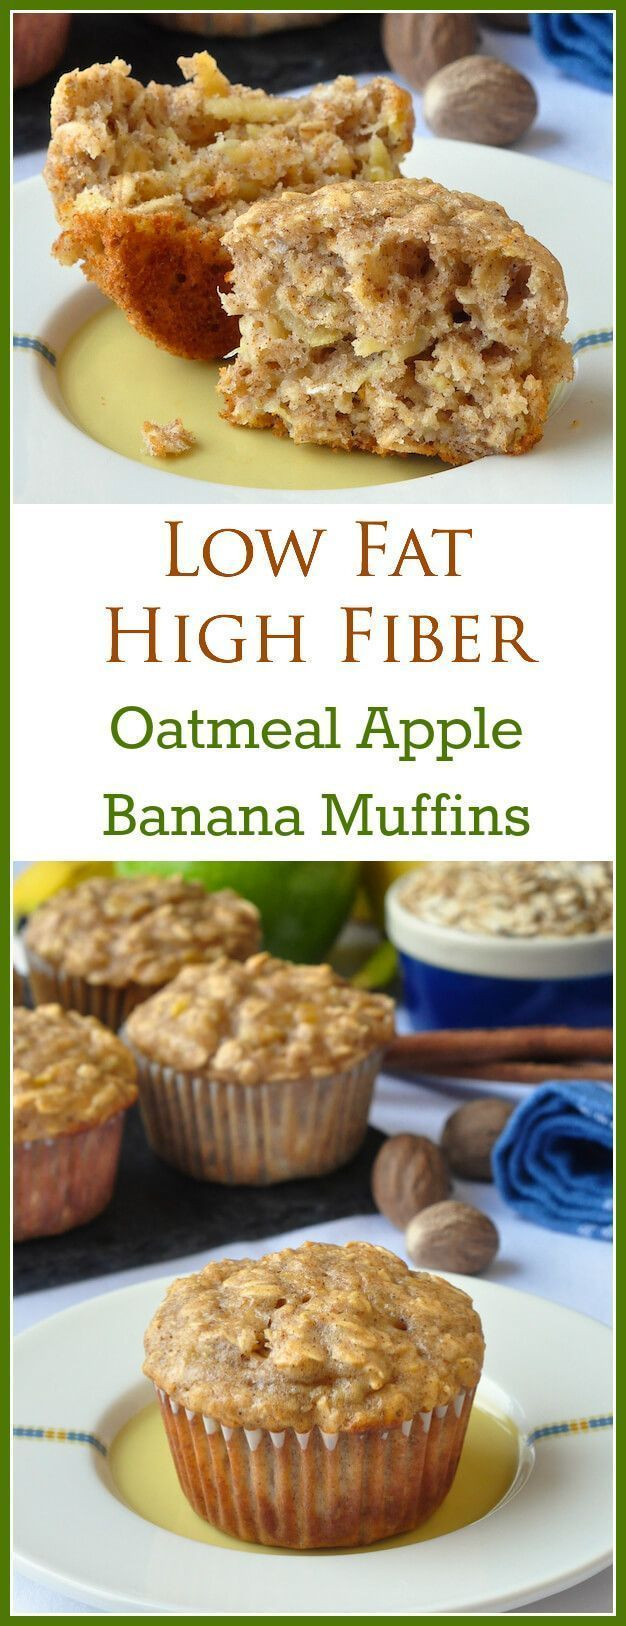 Low Fat Food Recipes  Oatmeal Apple Banana Low Fat Muffins Recipe